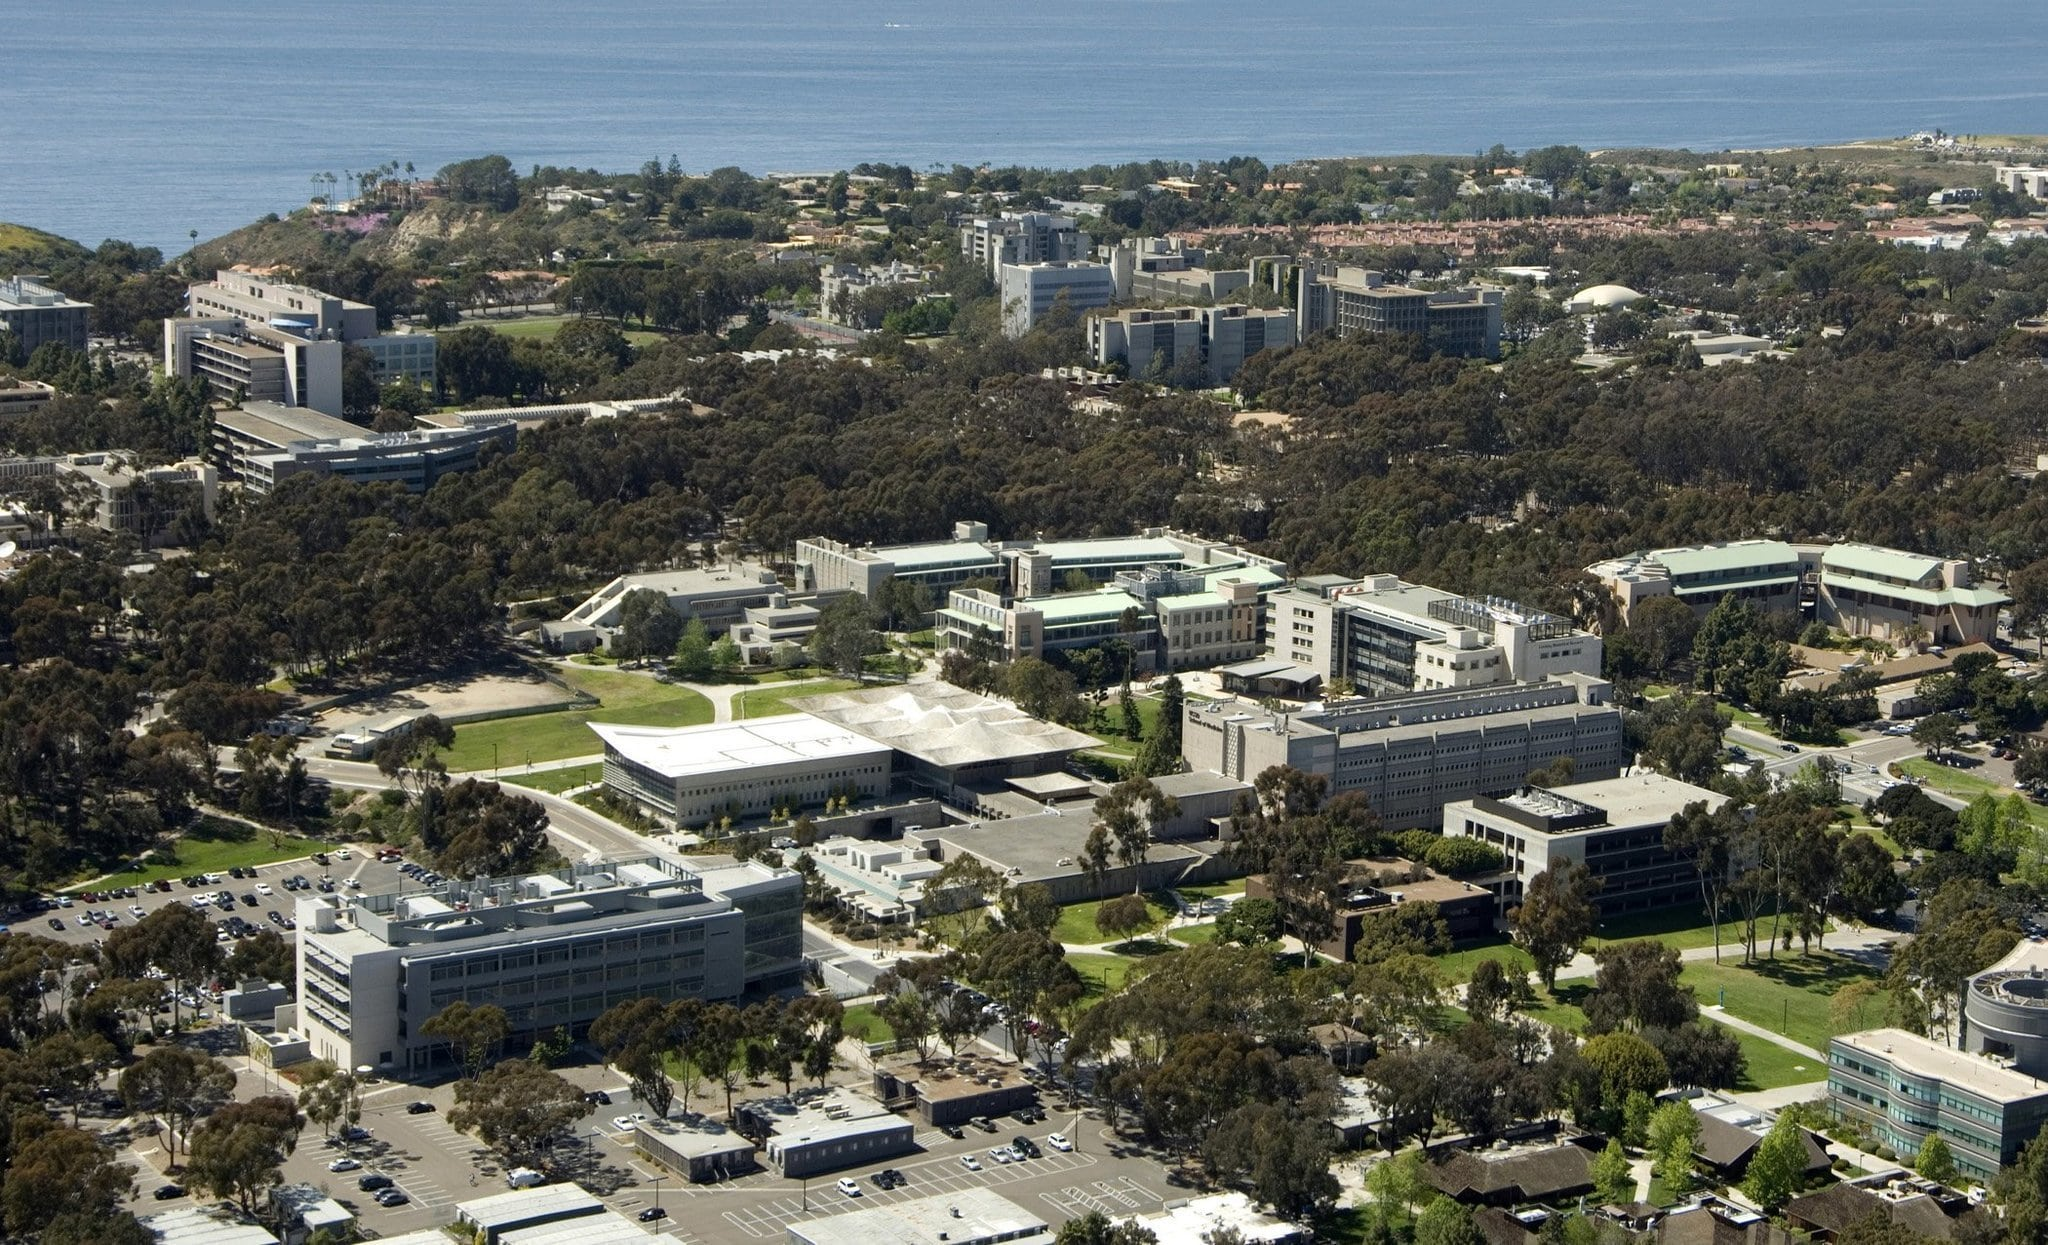 universidades de san diego